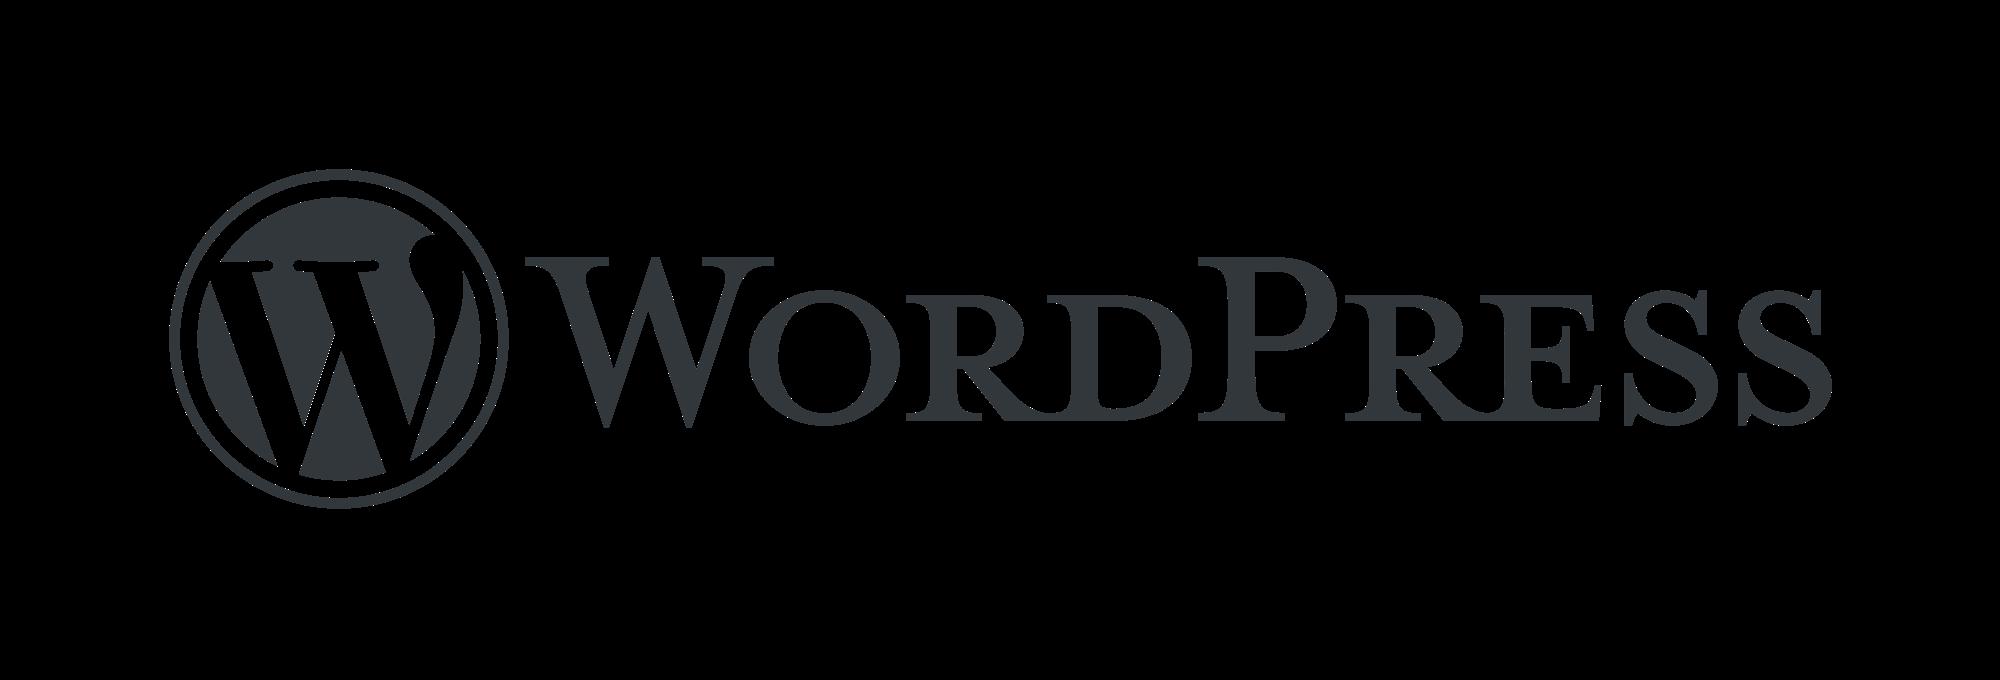 Das WordPress-Logo